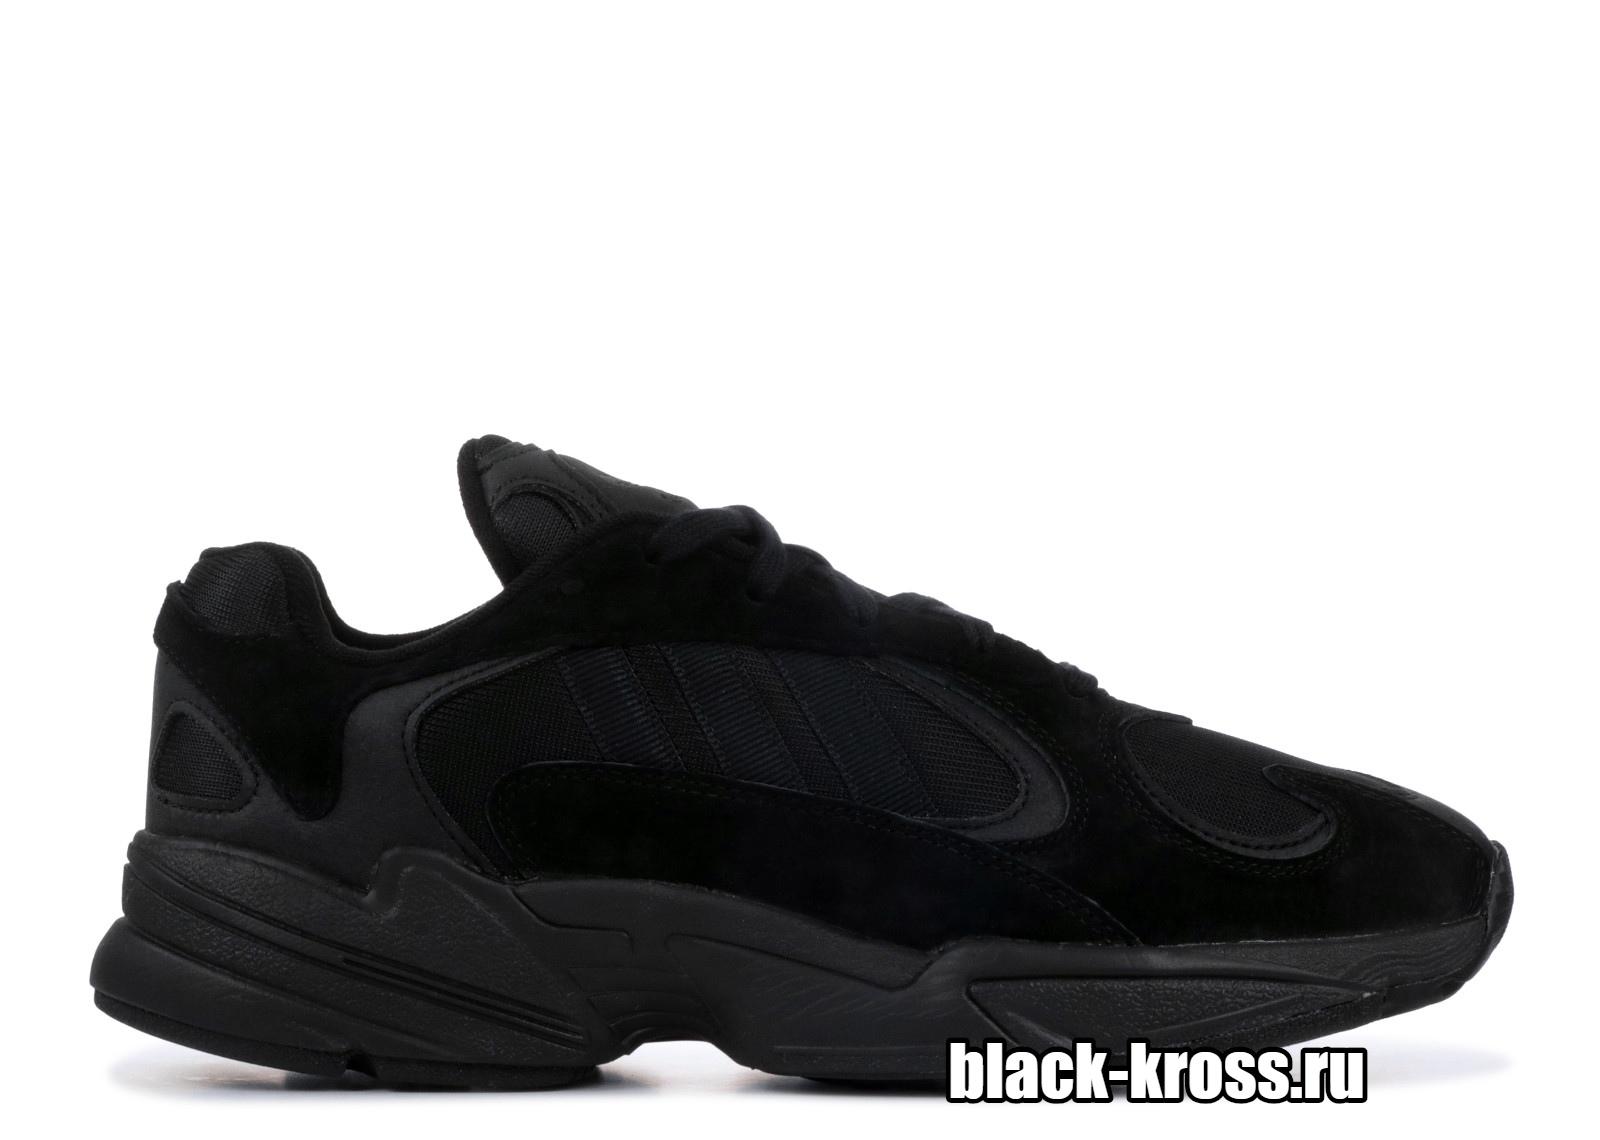 Adidas Yung-1 Black (36-45)